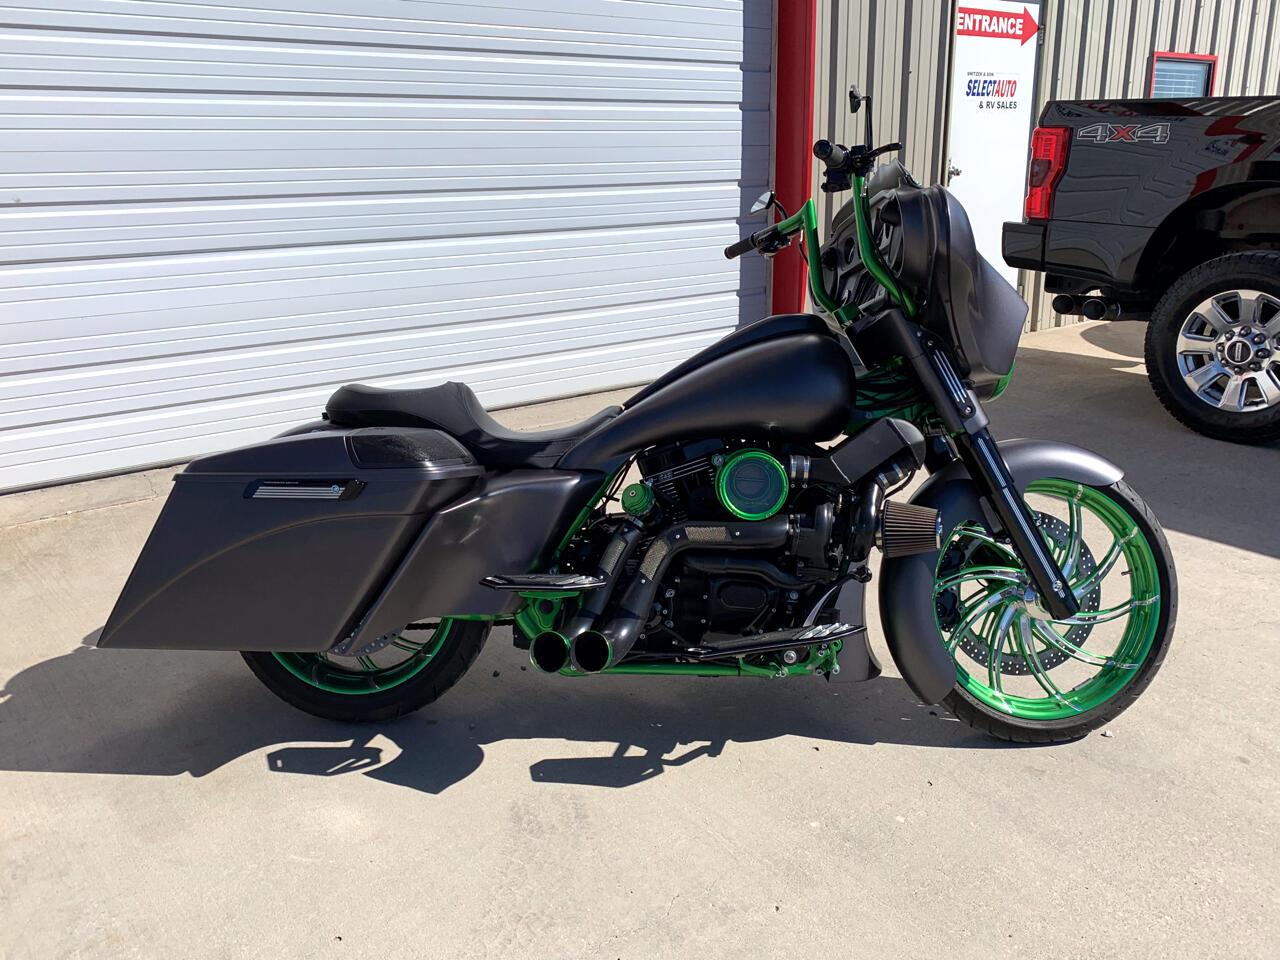 2016 Harley-Davidson Street Glide Special Custom